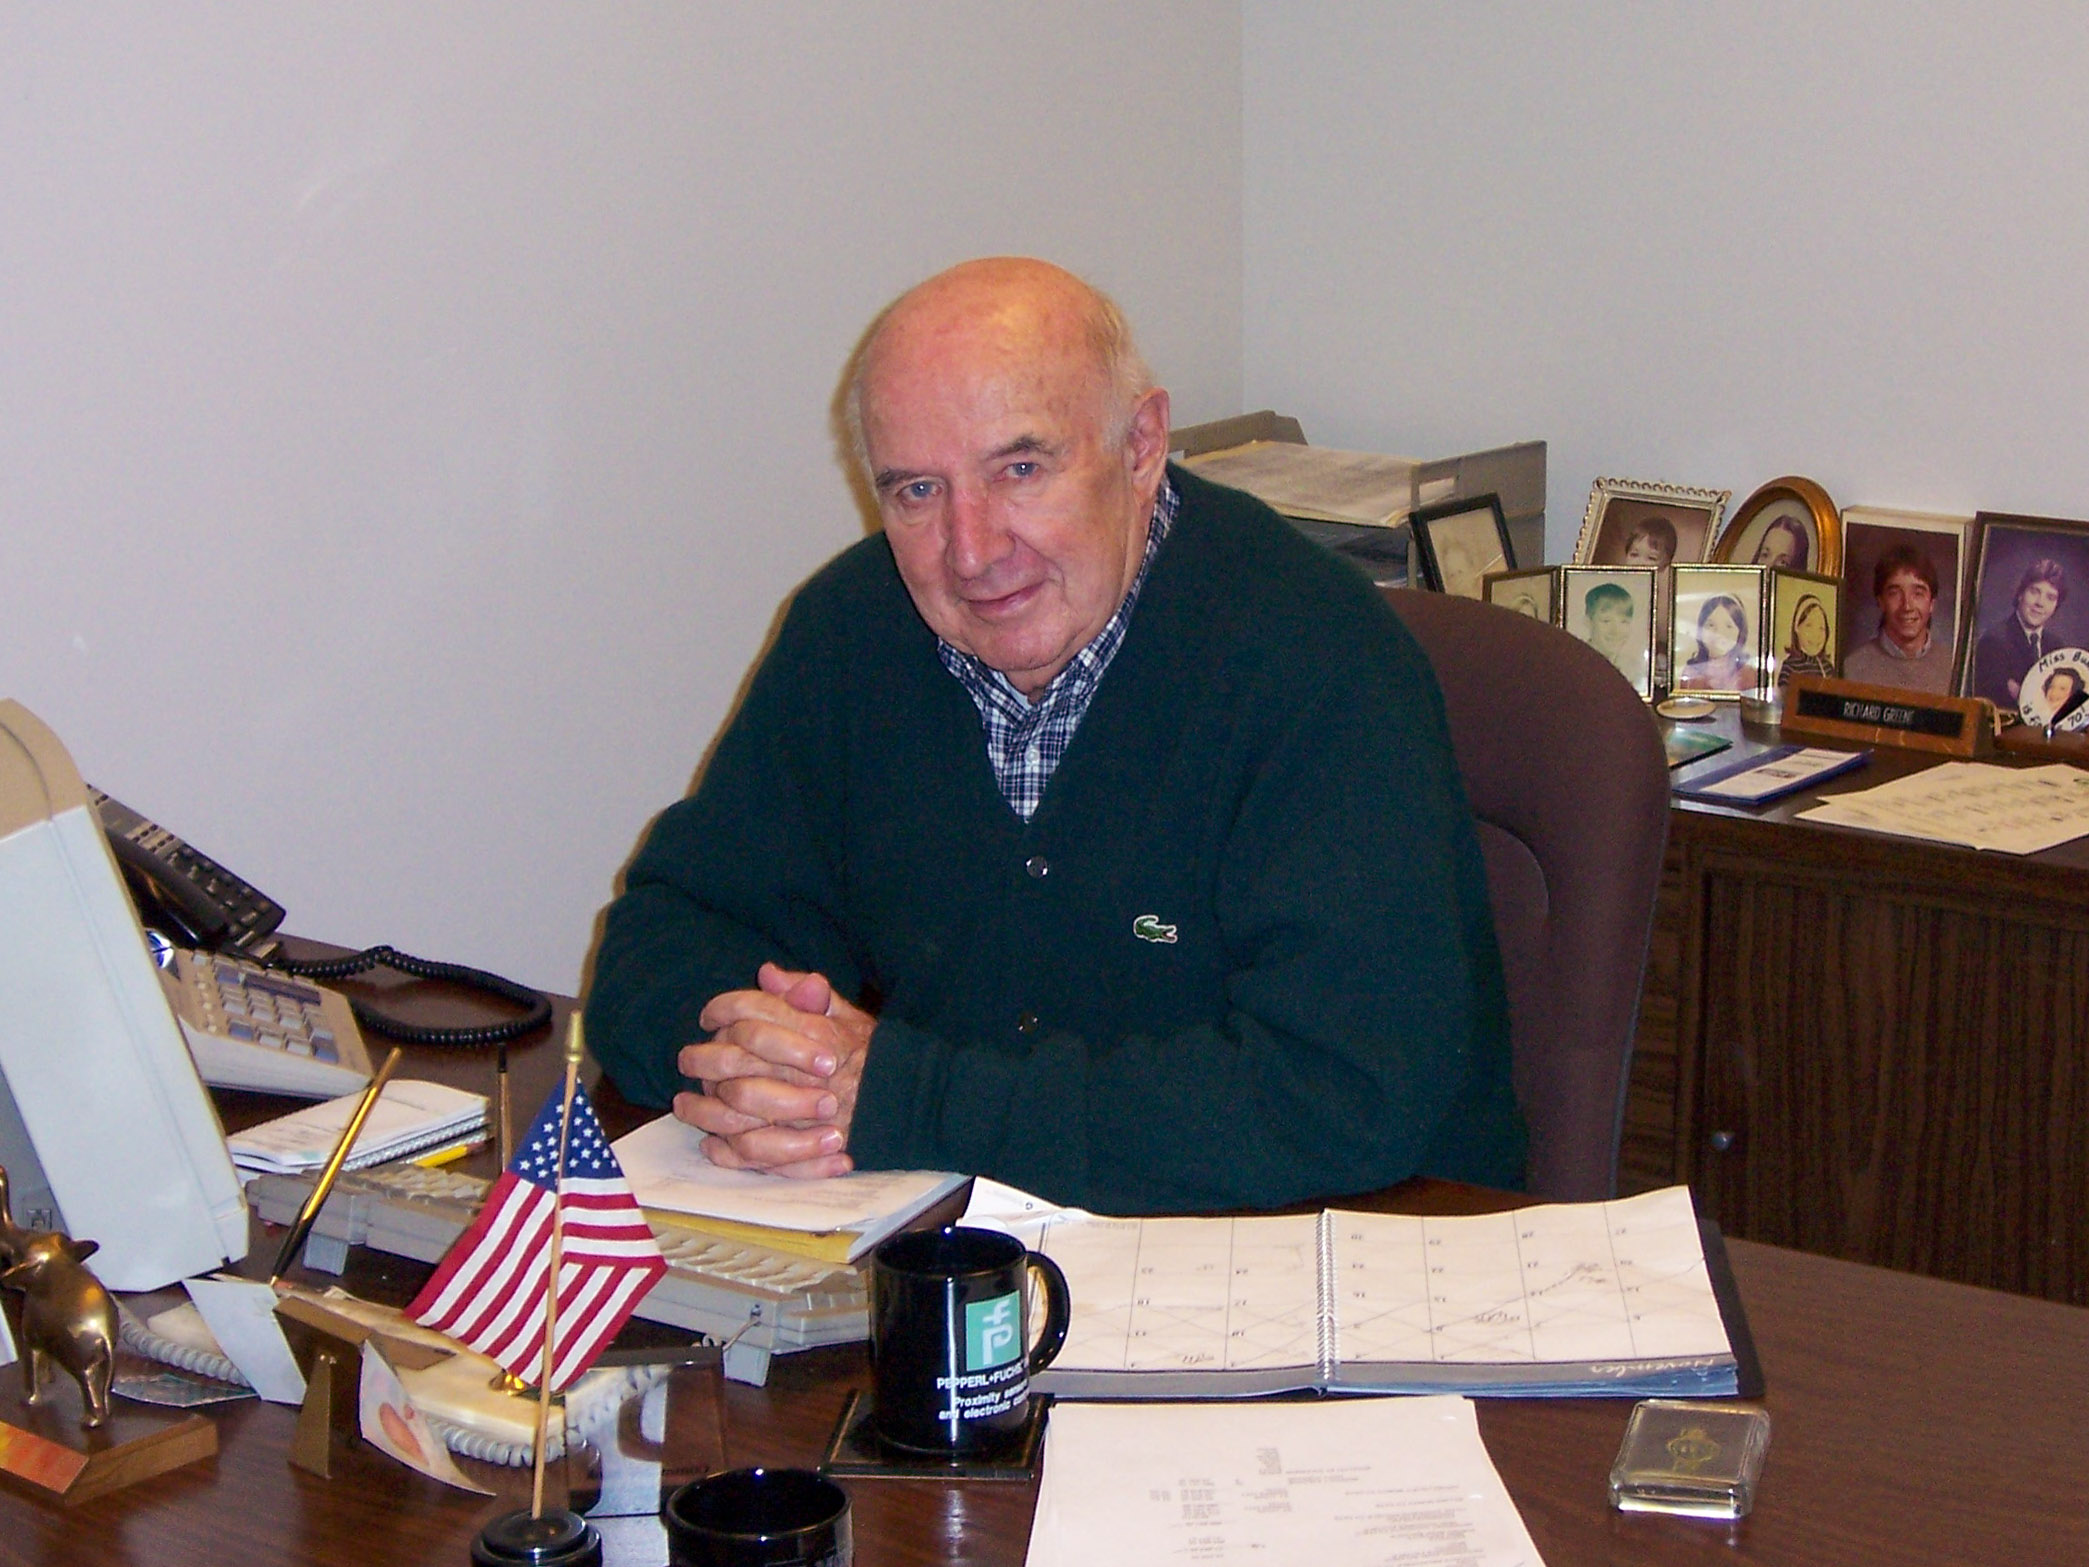 photo of Richard Greene, Company Founder